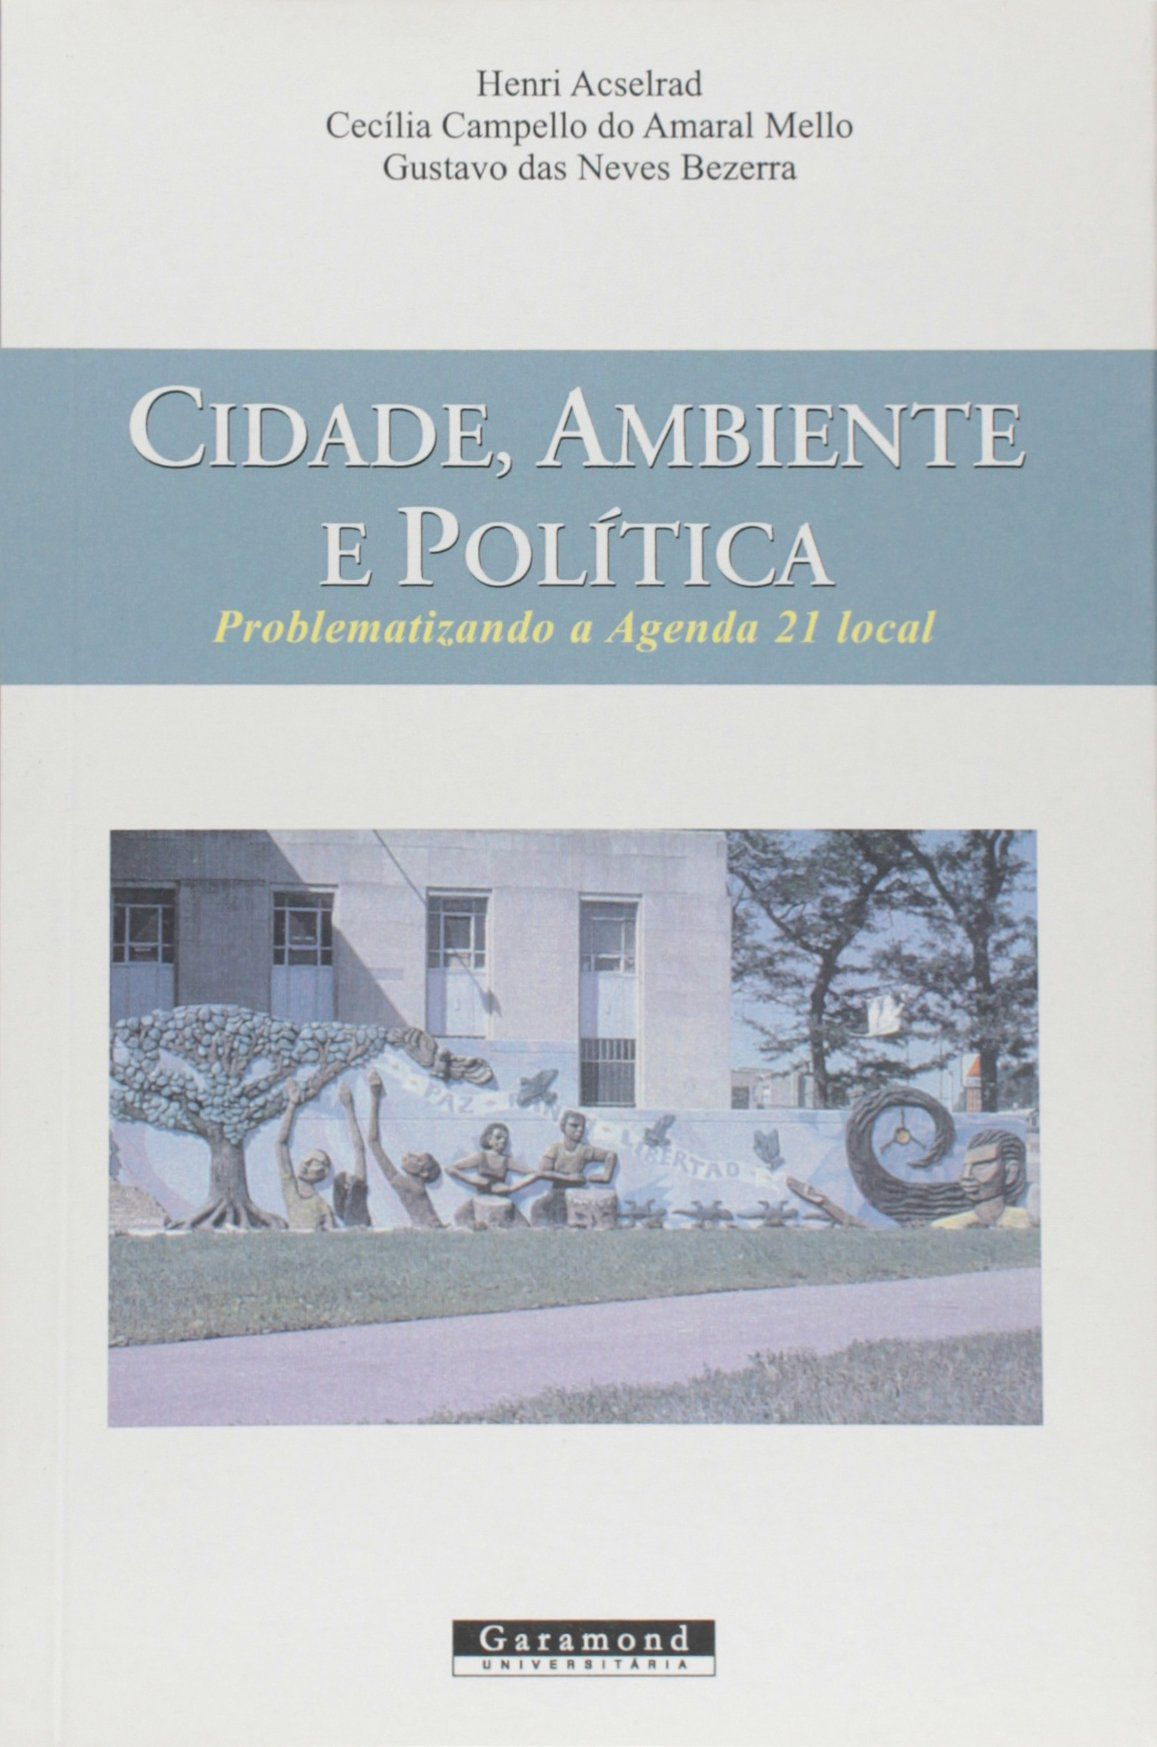 CICADE, AMBIENTE E POLITICA